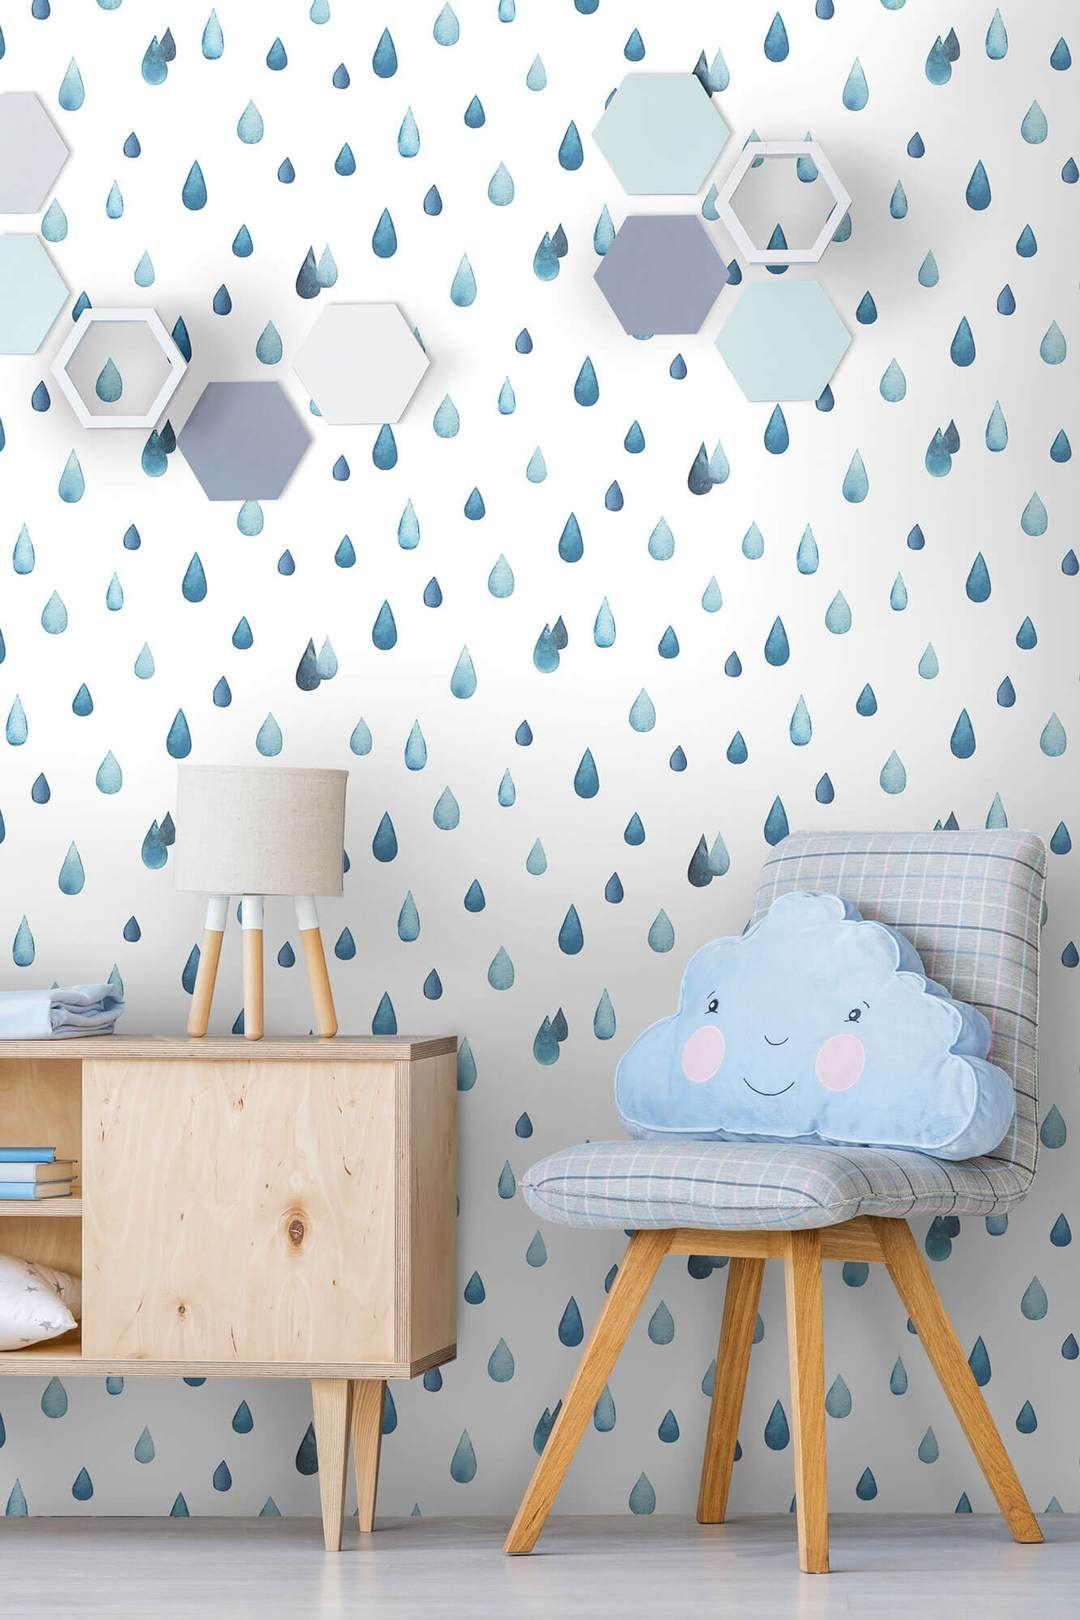 Raindrops Peel And Stick Wallpaper Girls Room Wallpaper Peel And Stick Wallpaper Pink Girl Room